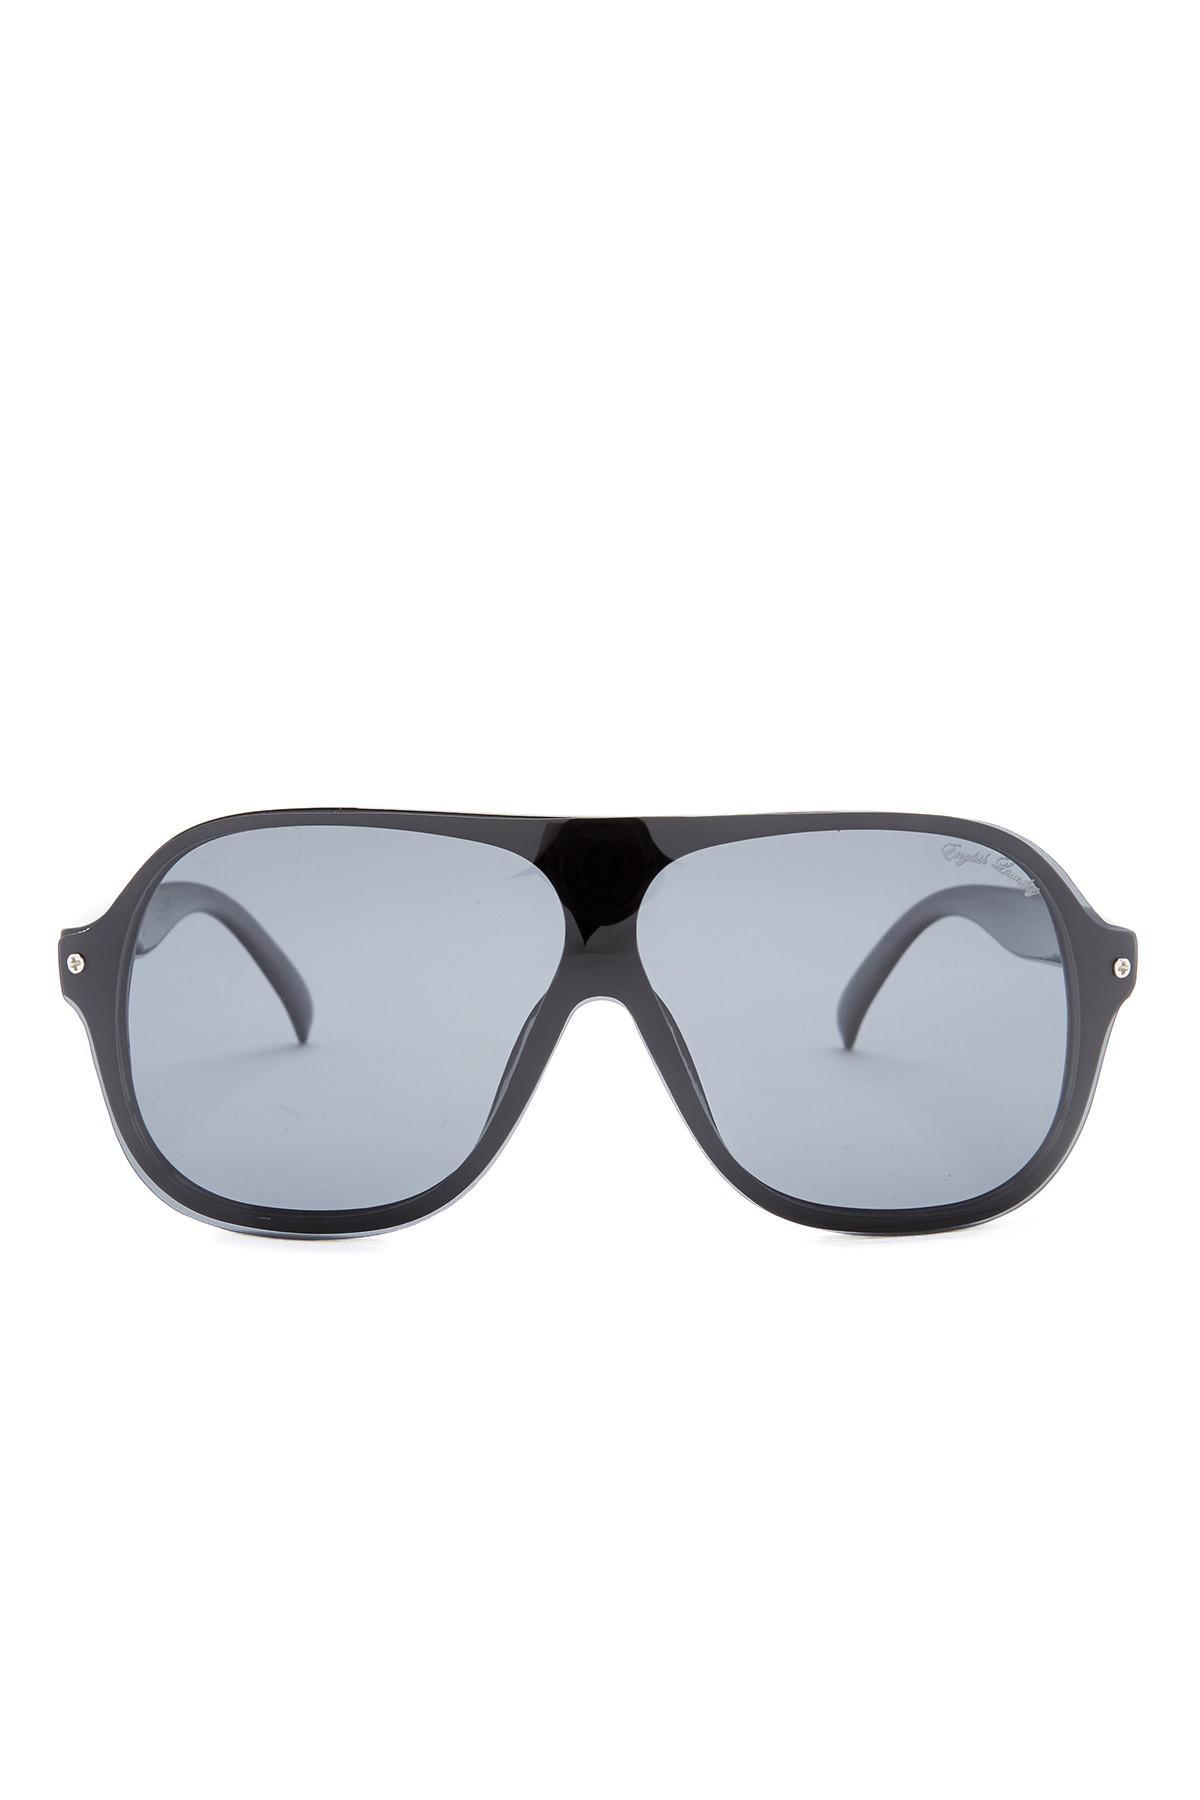 5139d6d70849 Lyst - English Laundry Men's Classic Polarized Sunglasses for Men